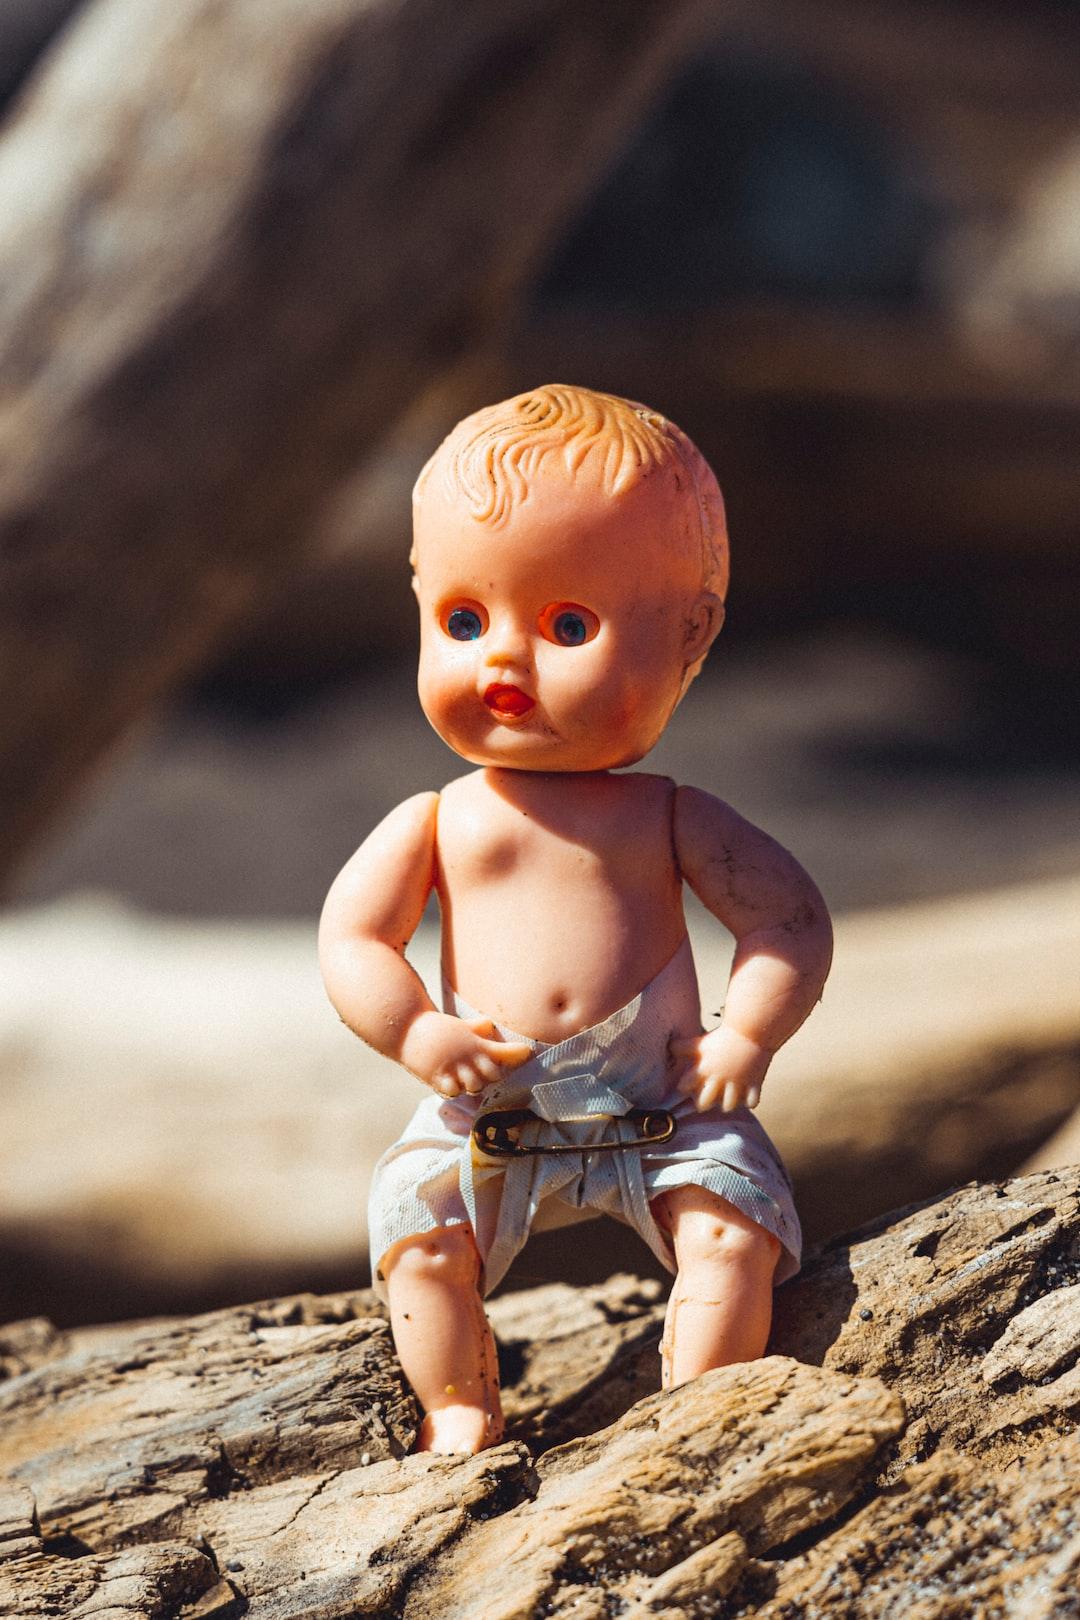 doll on log.